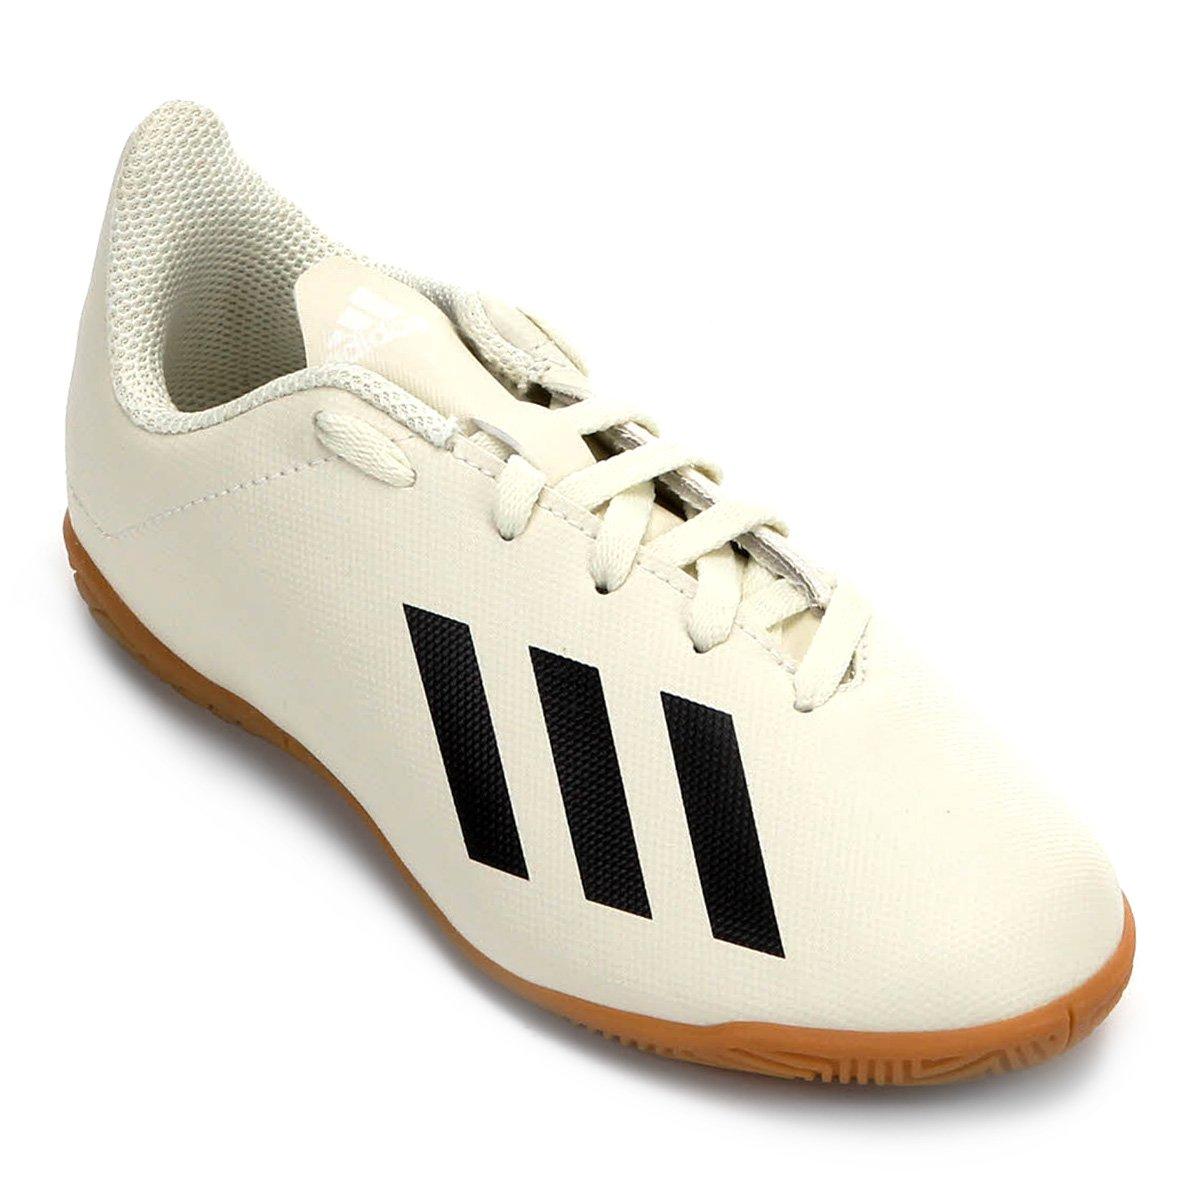 8749f24a9d Chuteira Futsal Infantil Adidas X Tango 18 4 In